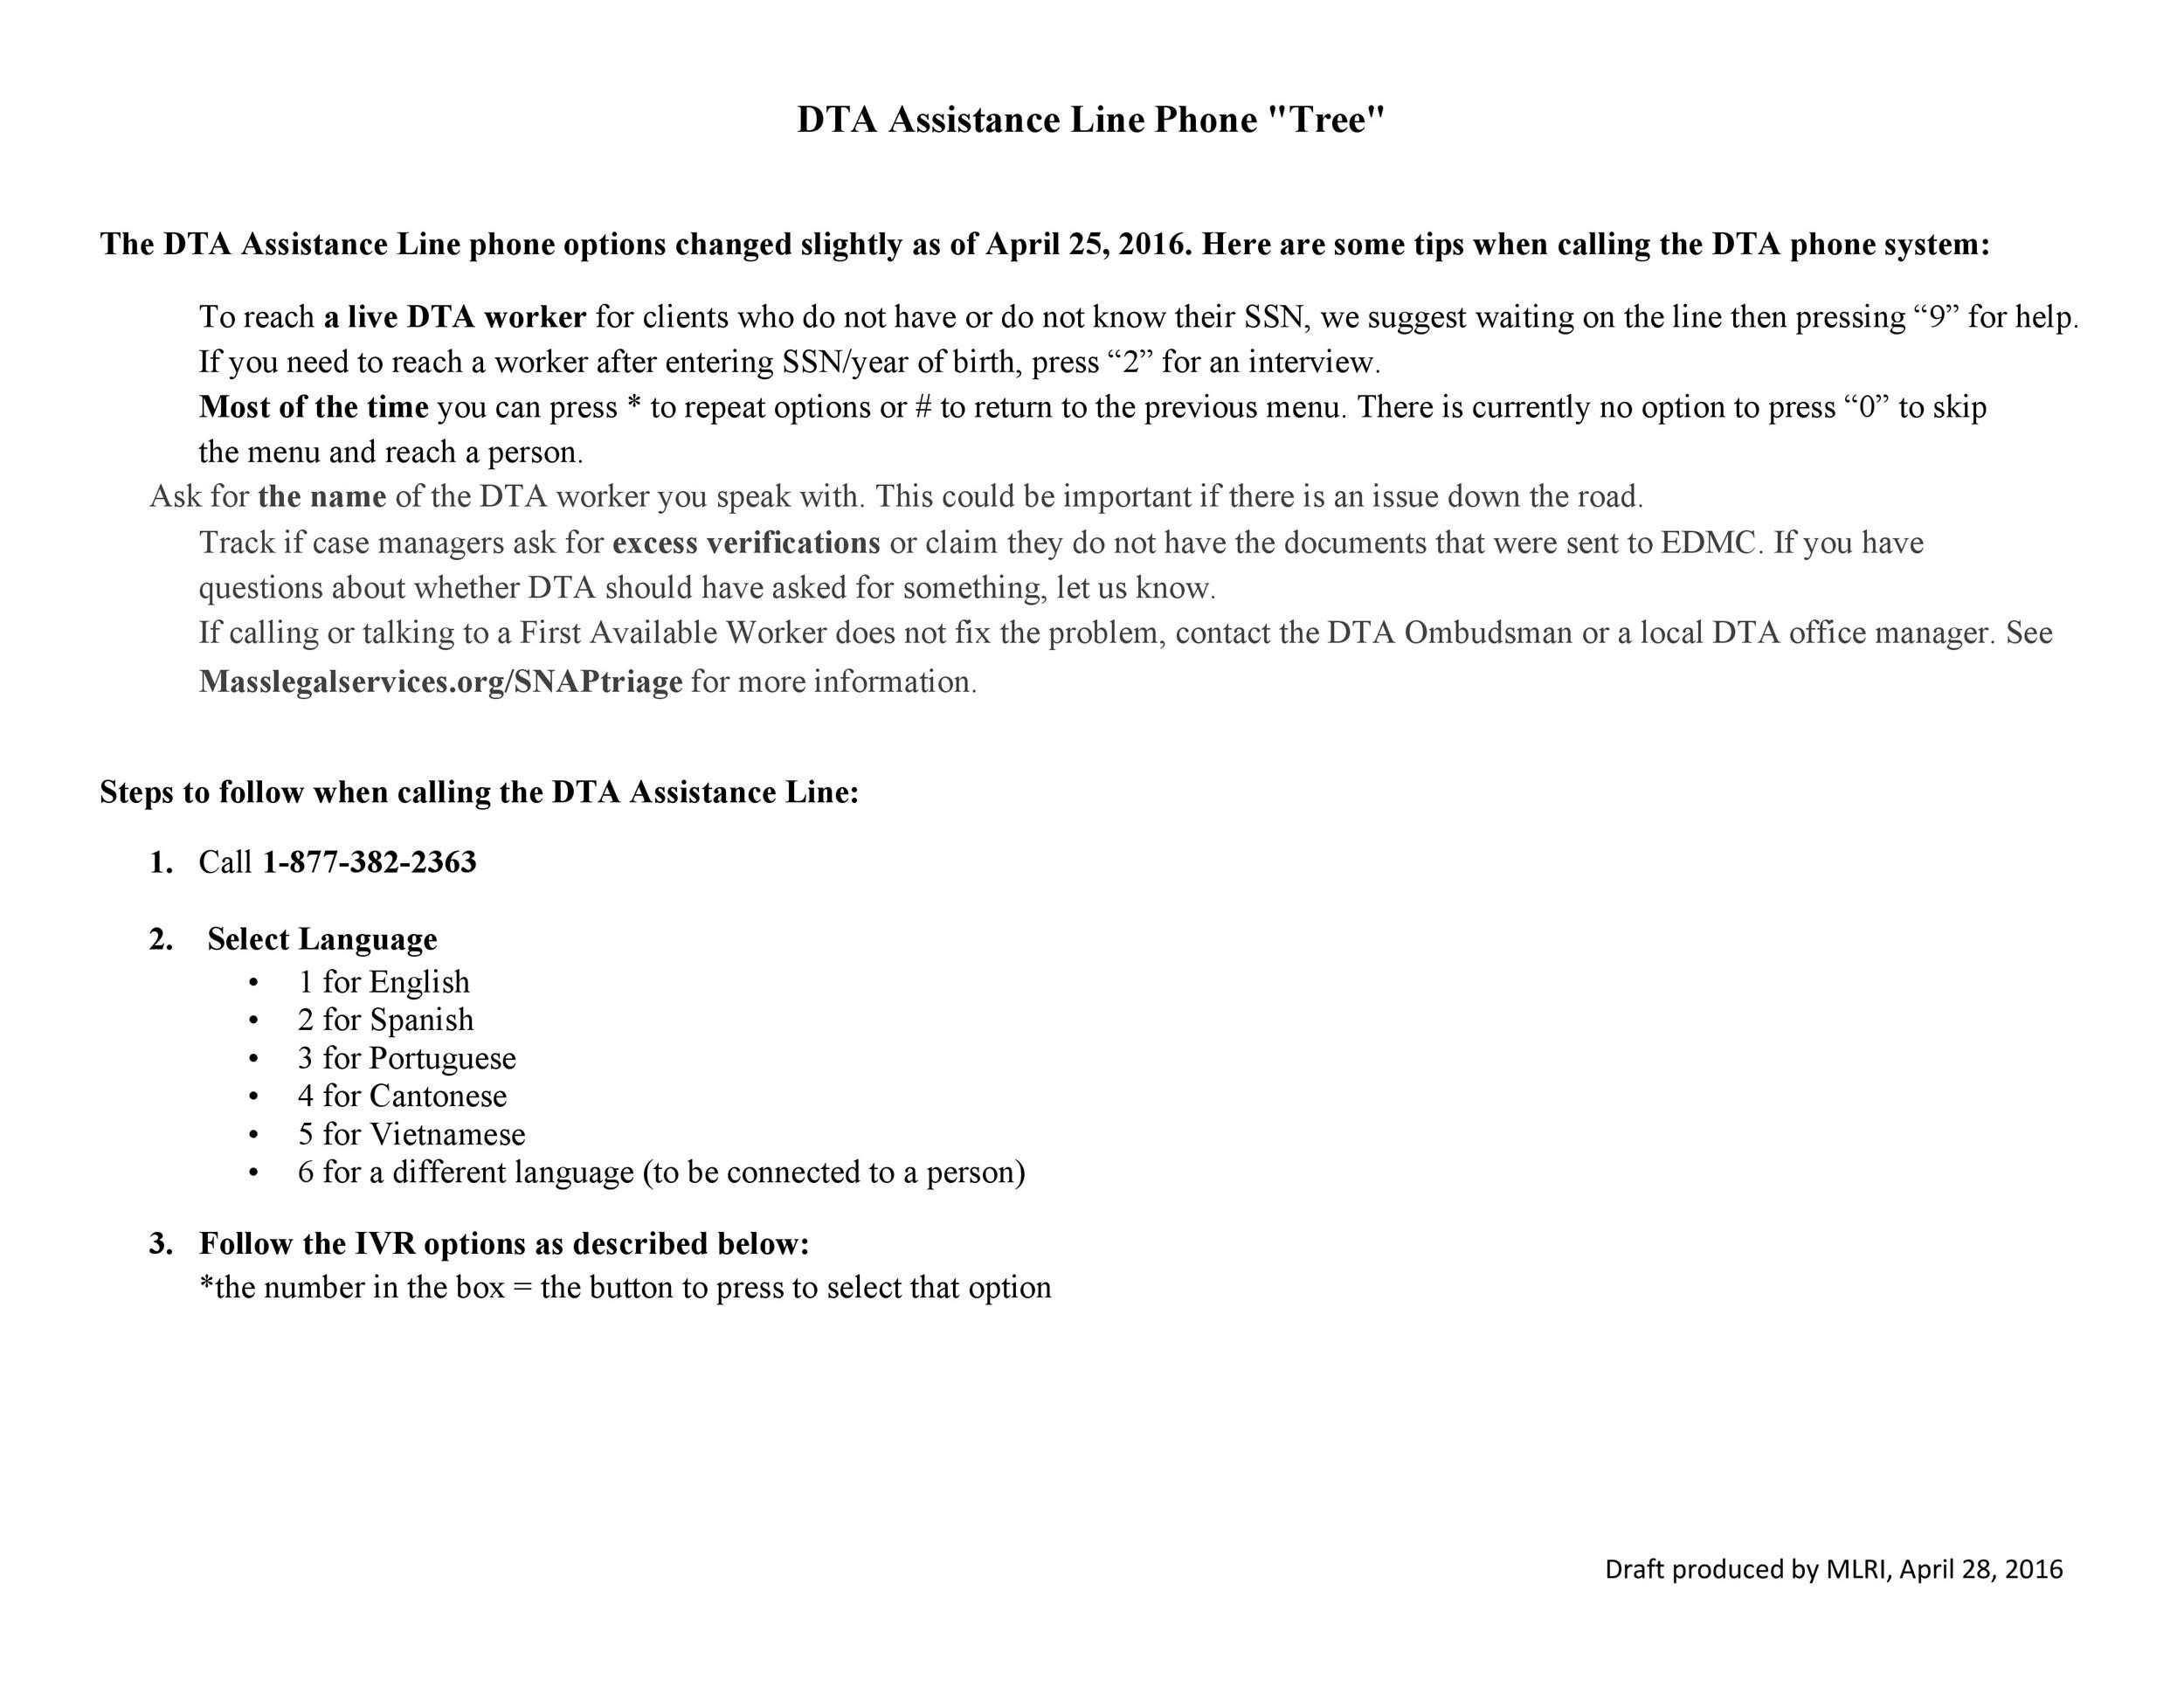 Free phone tree template 19